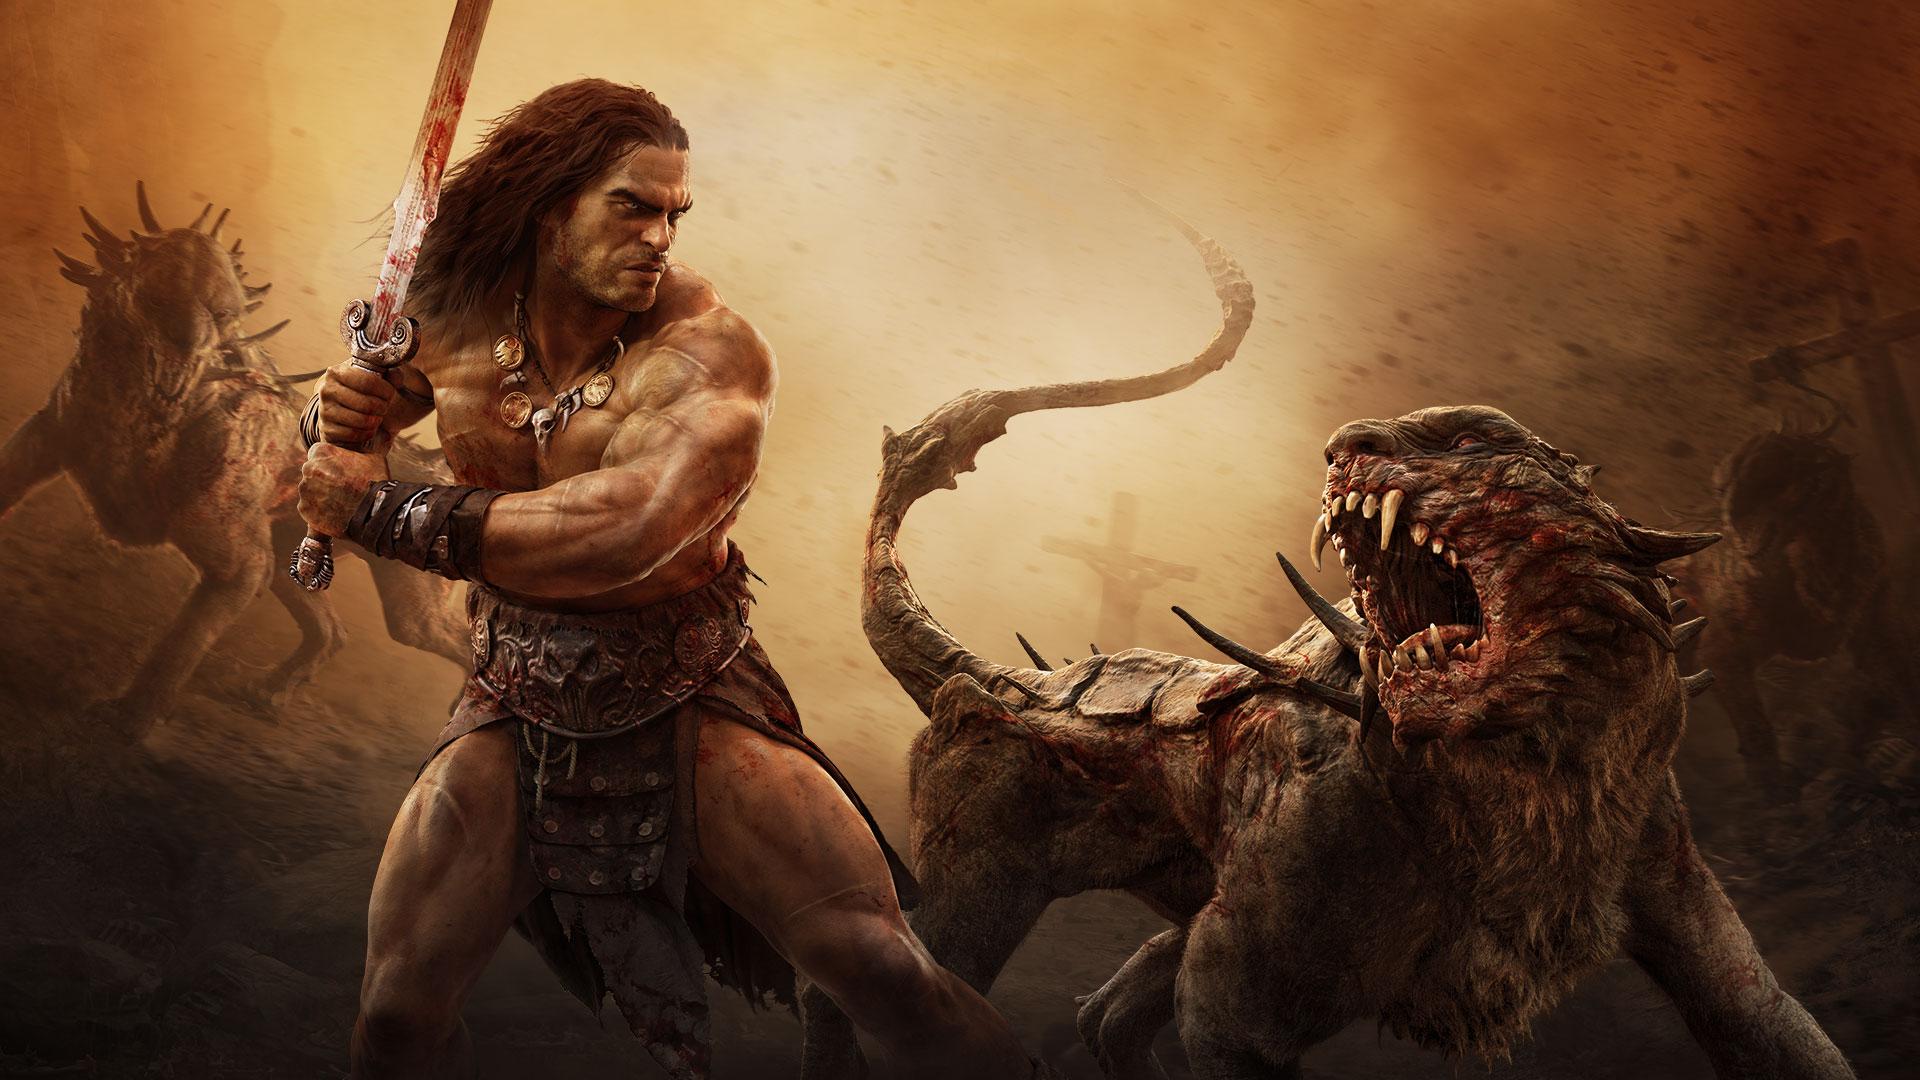 Neues MMO Conan Exiles: Alles zum Release auf PC, Xbox One, PS4